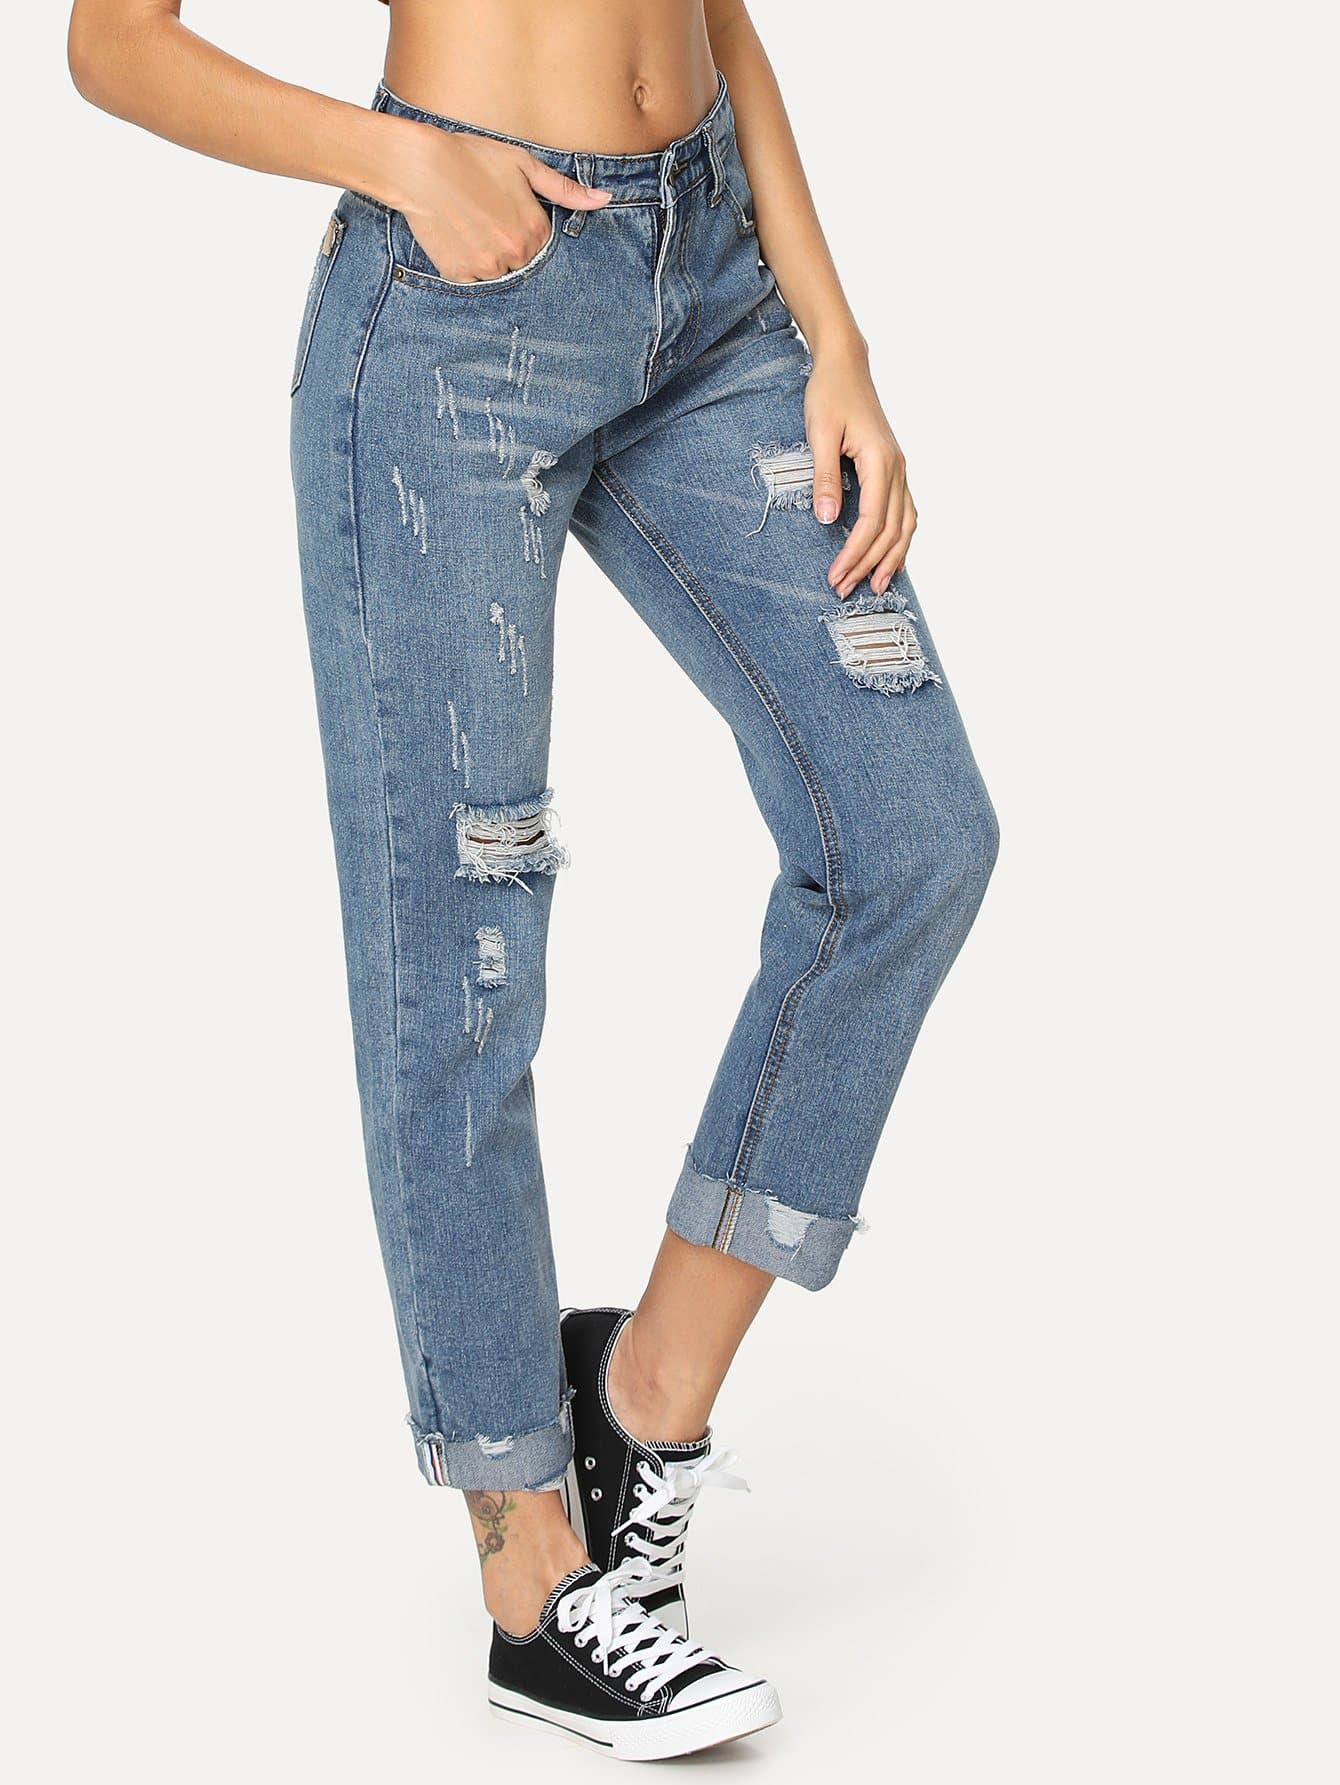 Frayed Hem Ripped Jeans ripped skinny frayed hem jeans